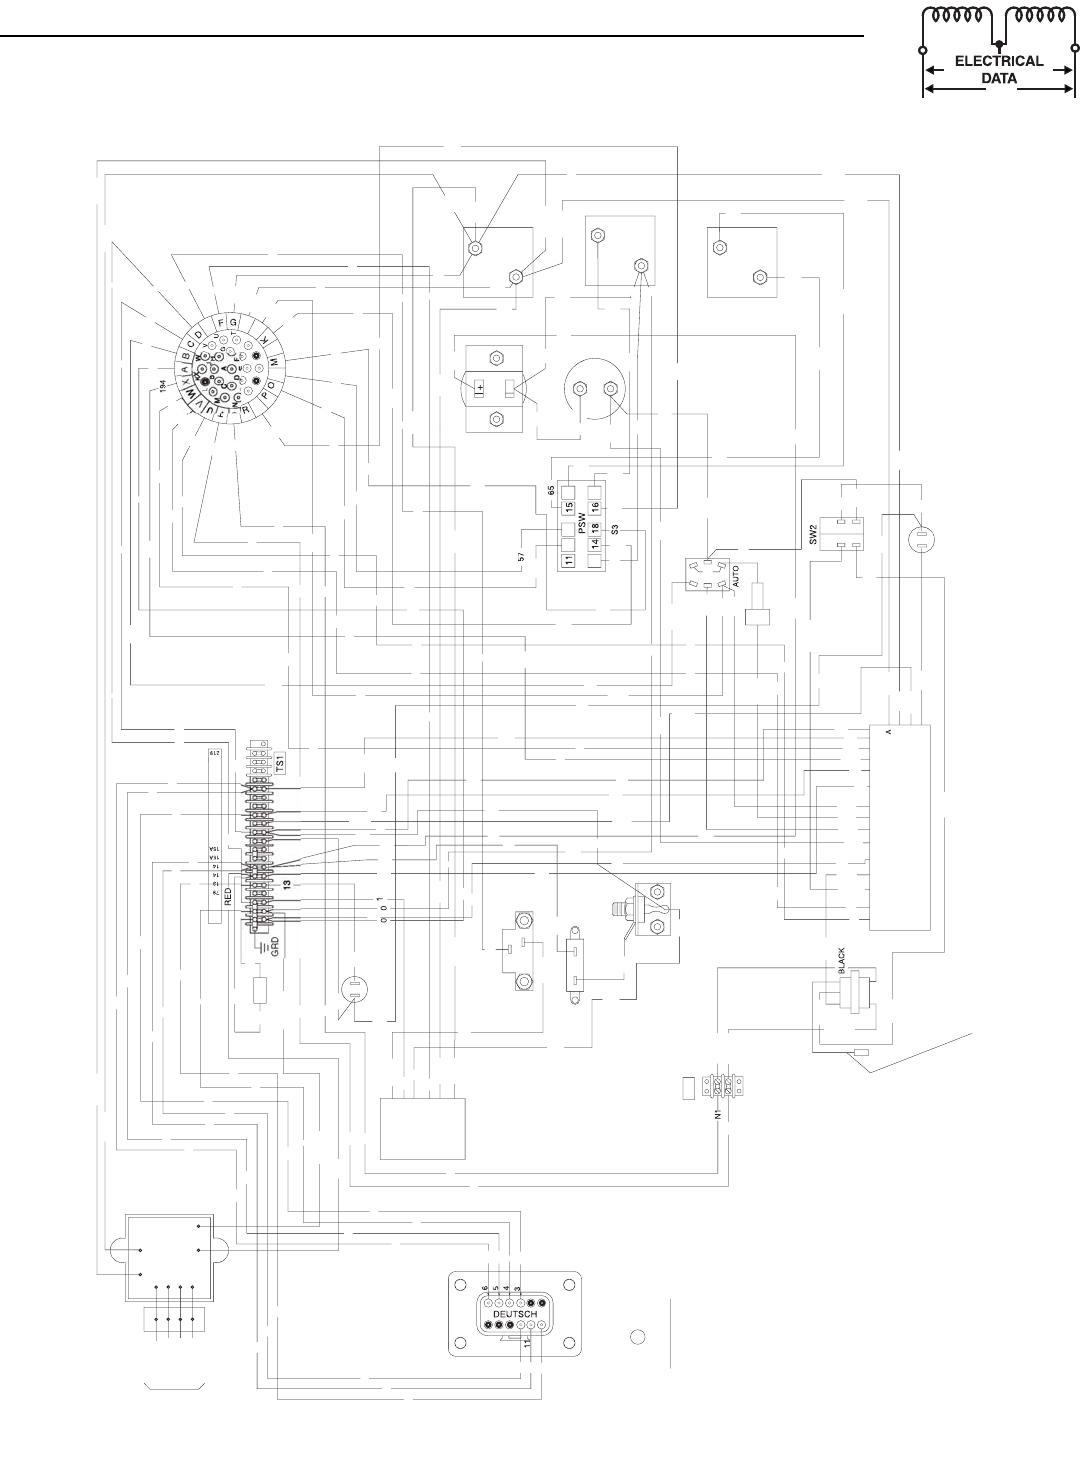 generac engine wiring diagram generac power systems 0043733  0043734  0043735  0046262  0046263  generac power systems 0043733  0043734